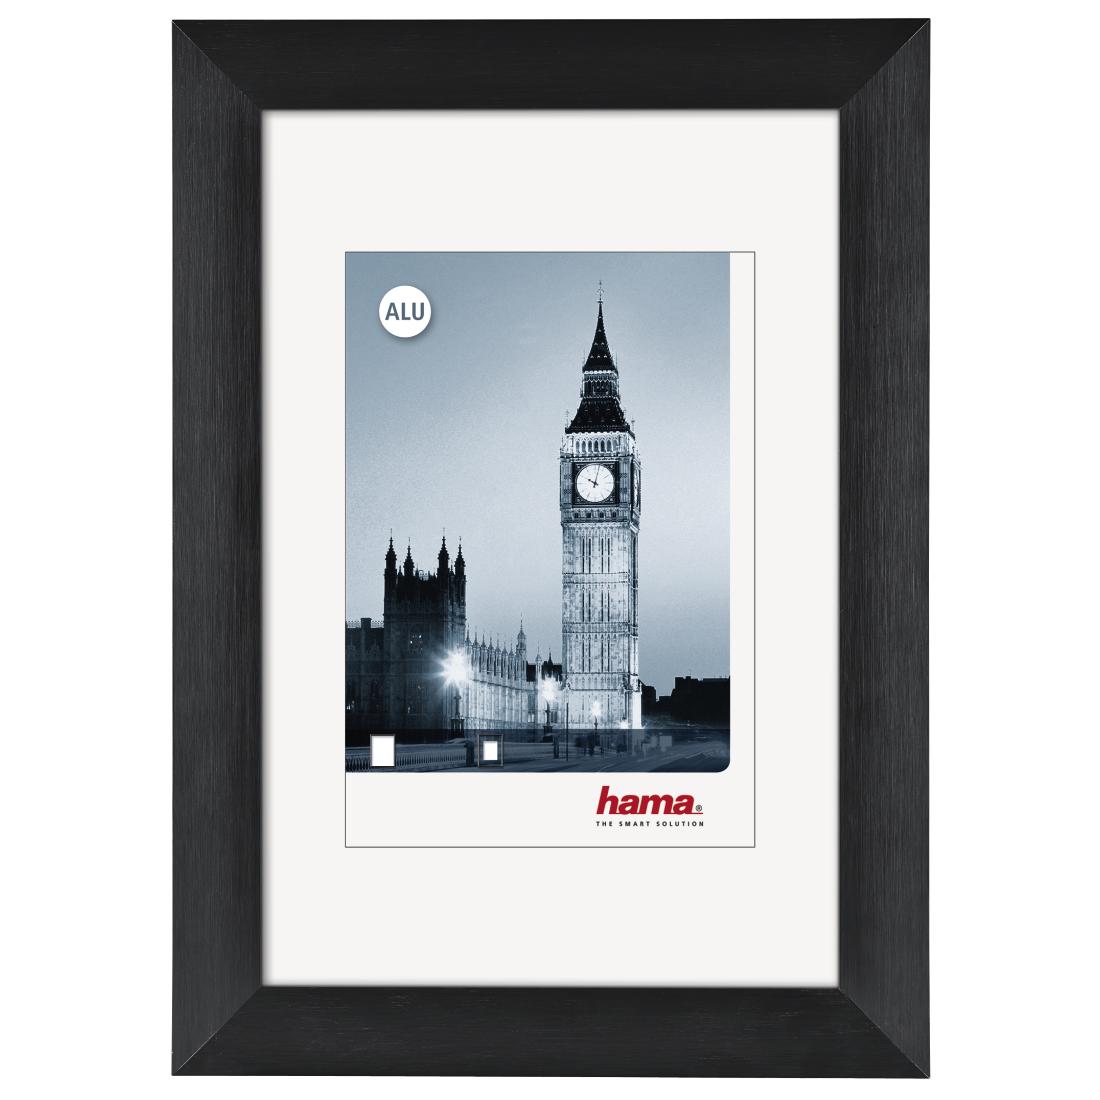 00084934 Hama London Aluminium Frame Black 30 X 40 Cm Hama De